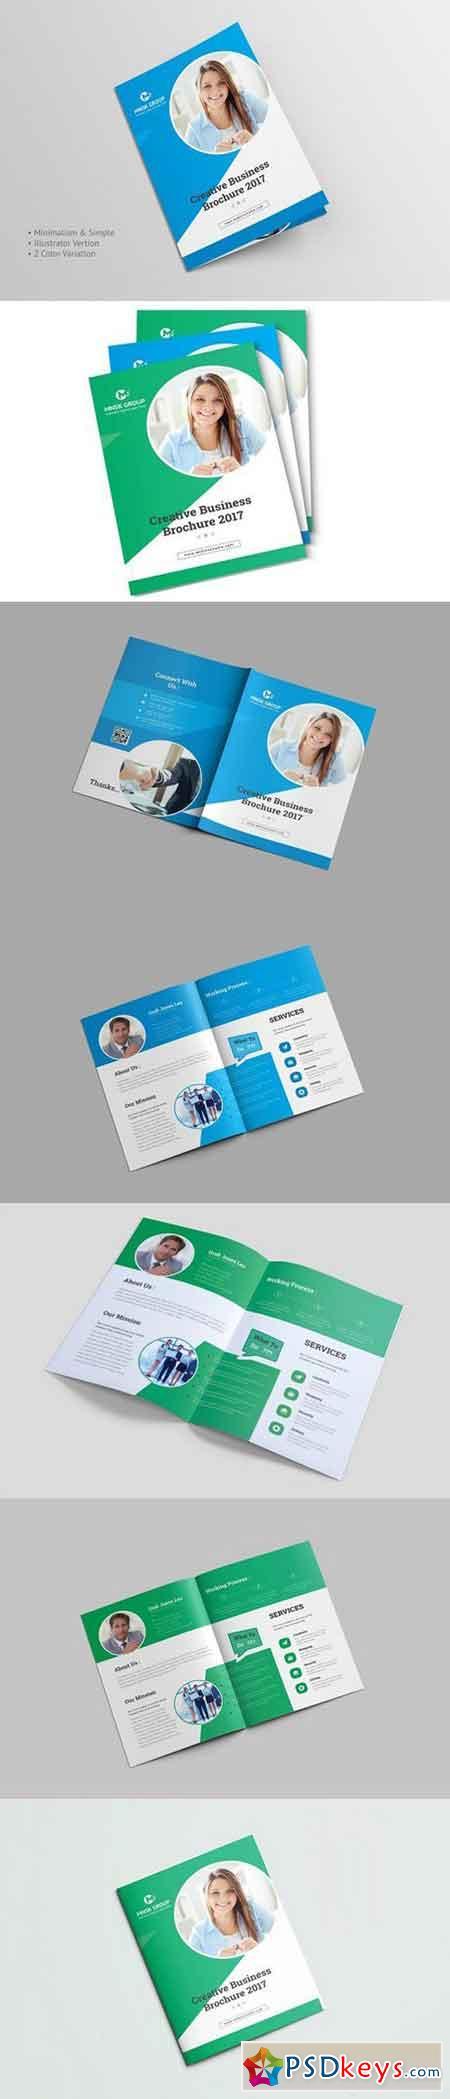 Bi fold brochure 1498719 free download photoshop vector for Bi fold brochure template illustrator